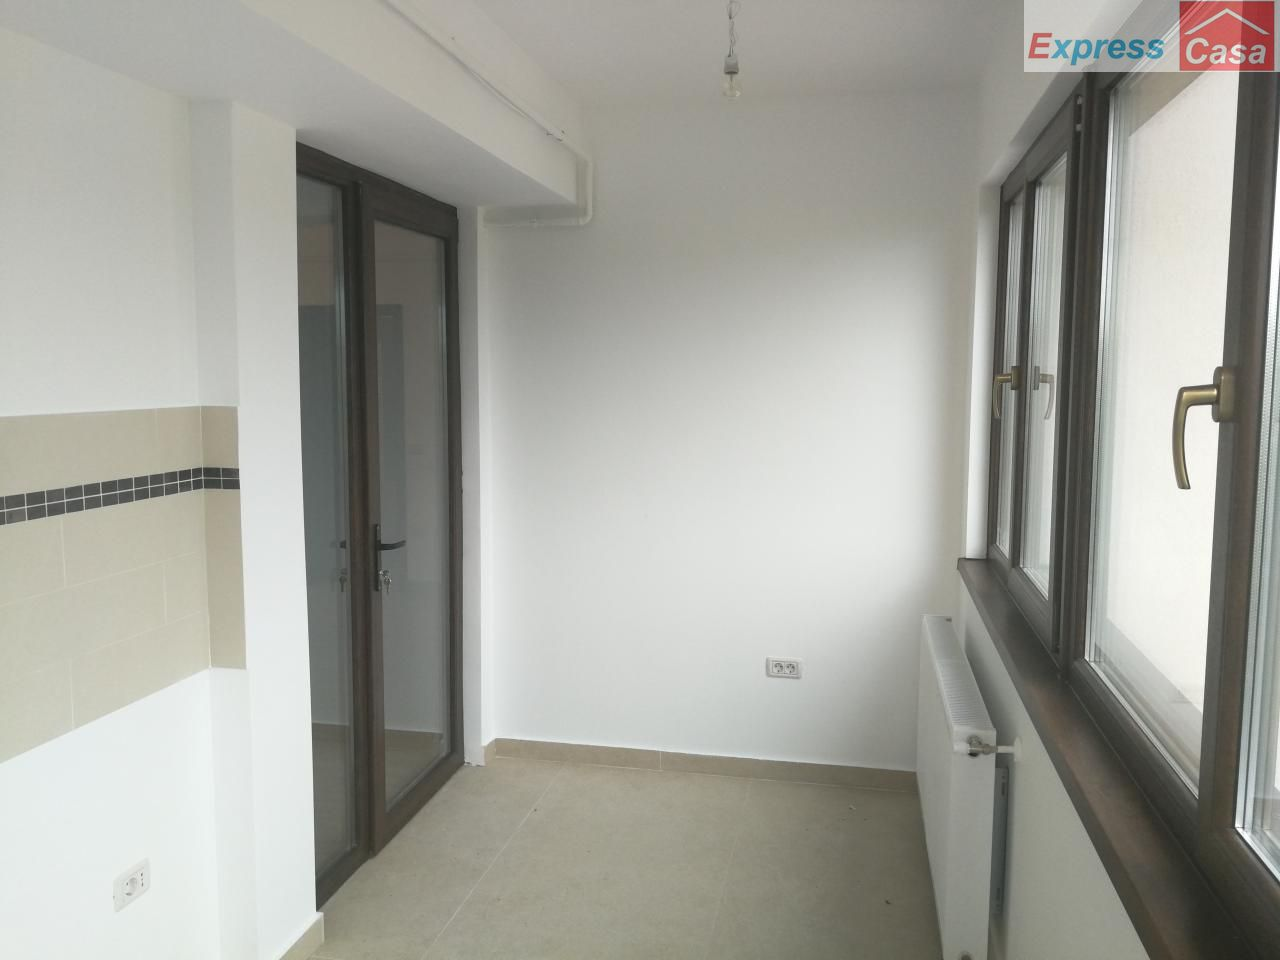 Apartament de vanzare, Iași (judet), Nicolina 1 - Foto 8